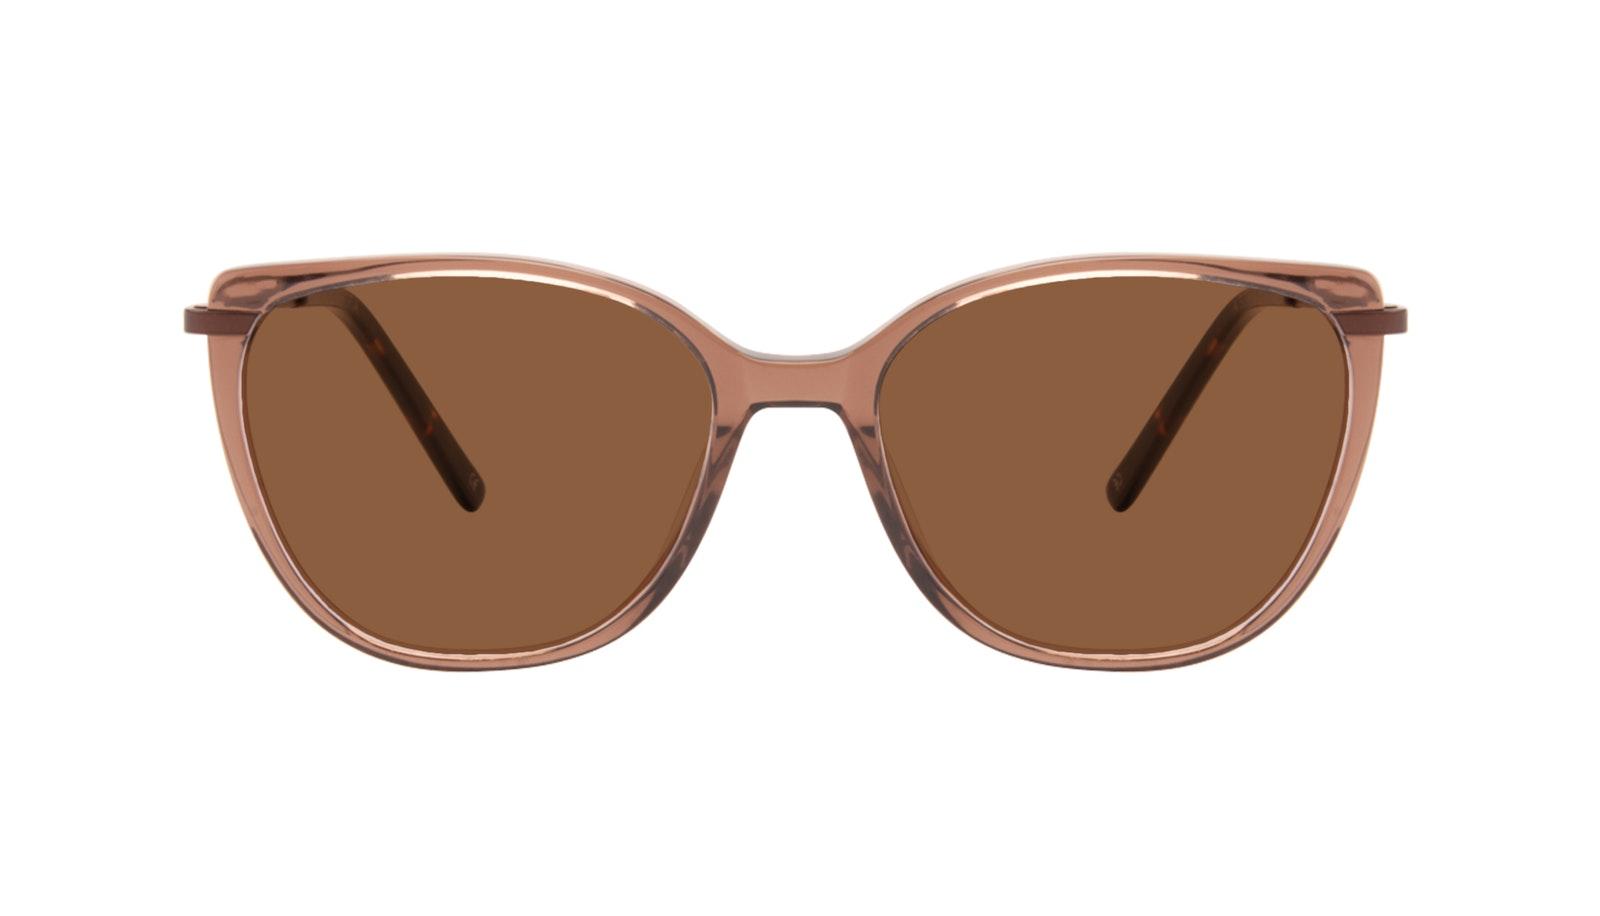 Affordable Fashion Glasses Rectangle Square Sunglasses Women Illusion Terra